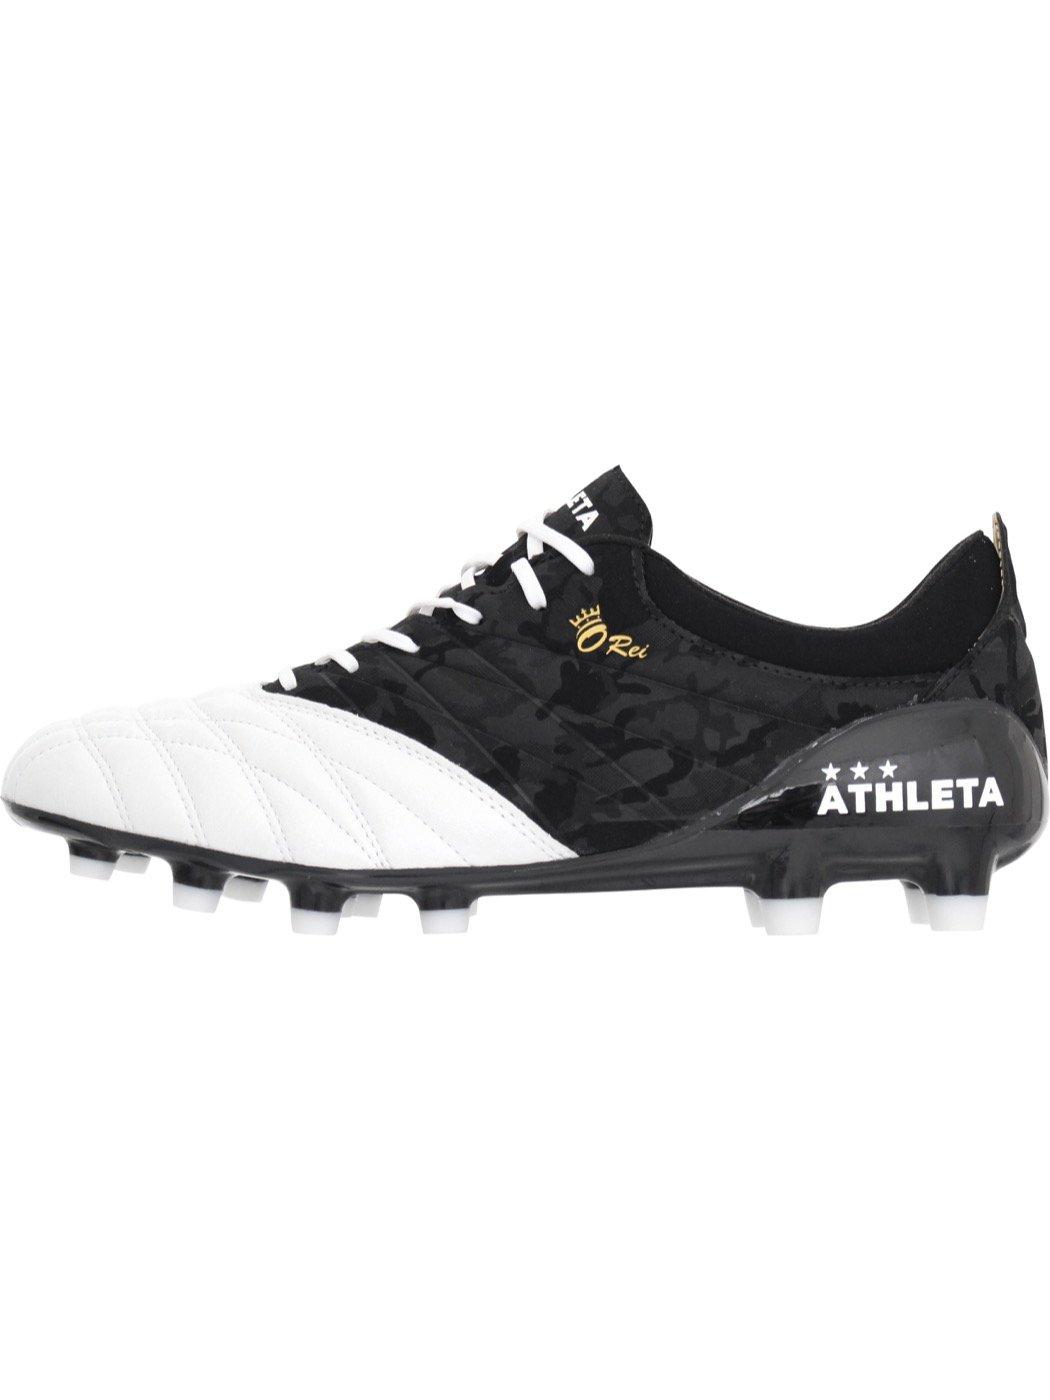 ATHLETA(アスレタ) O-Rei Futebol T001 10002-BLPW B01MCQF1EO 25 7018ブラック×パールホワイト